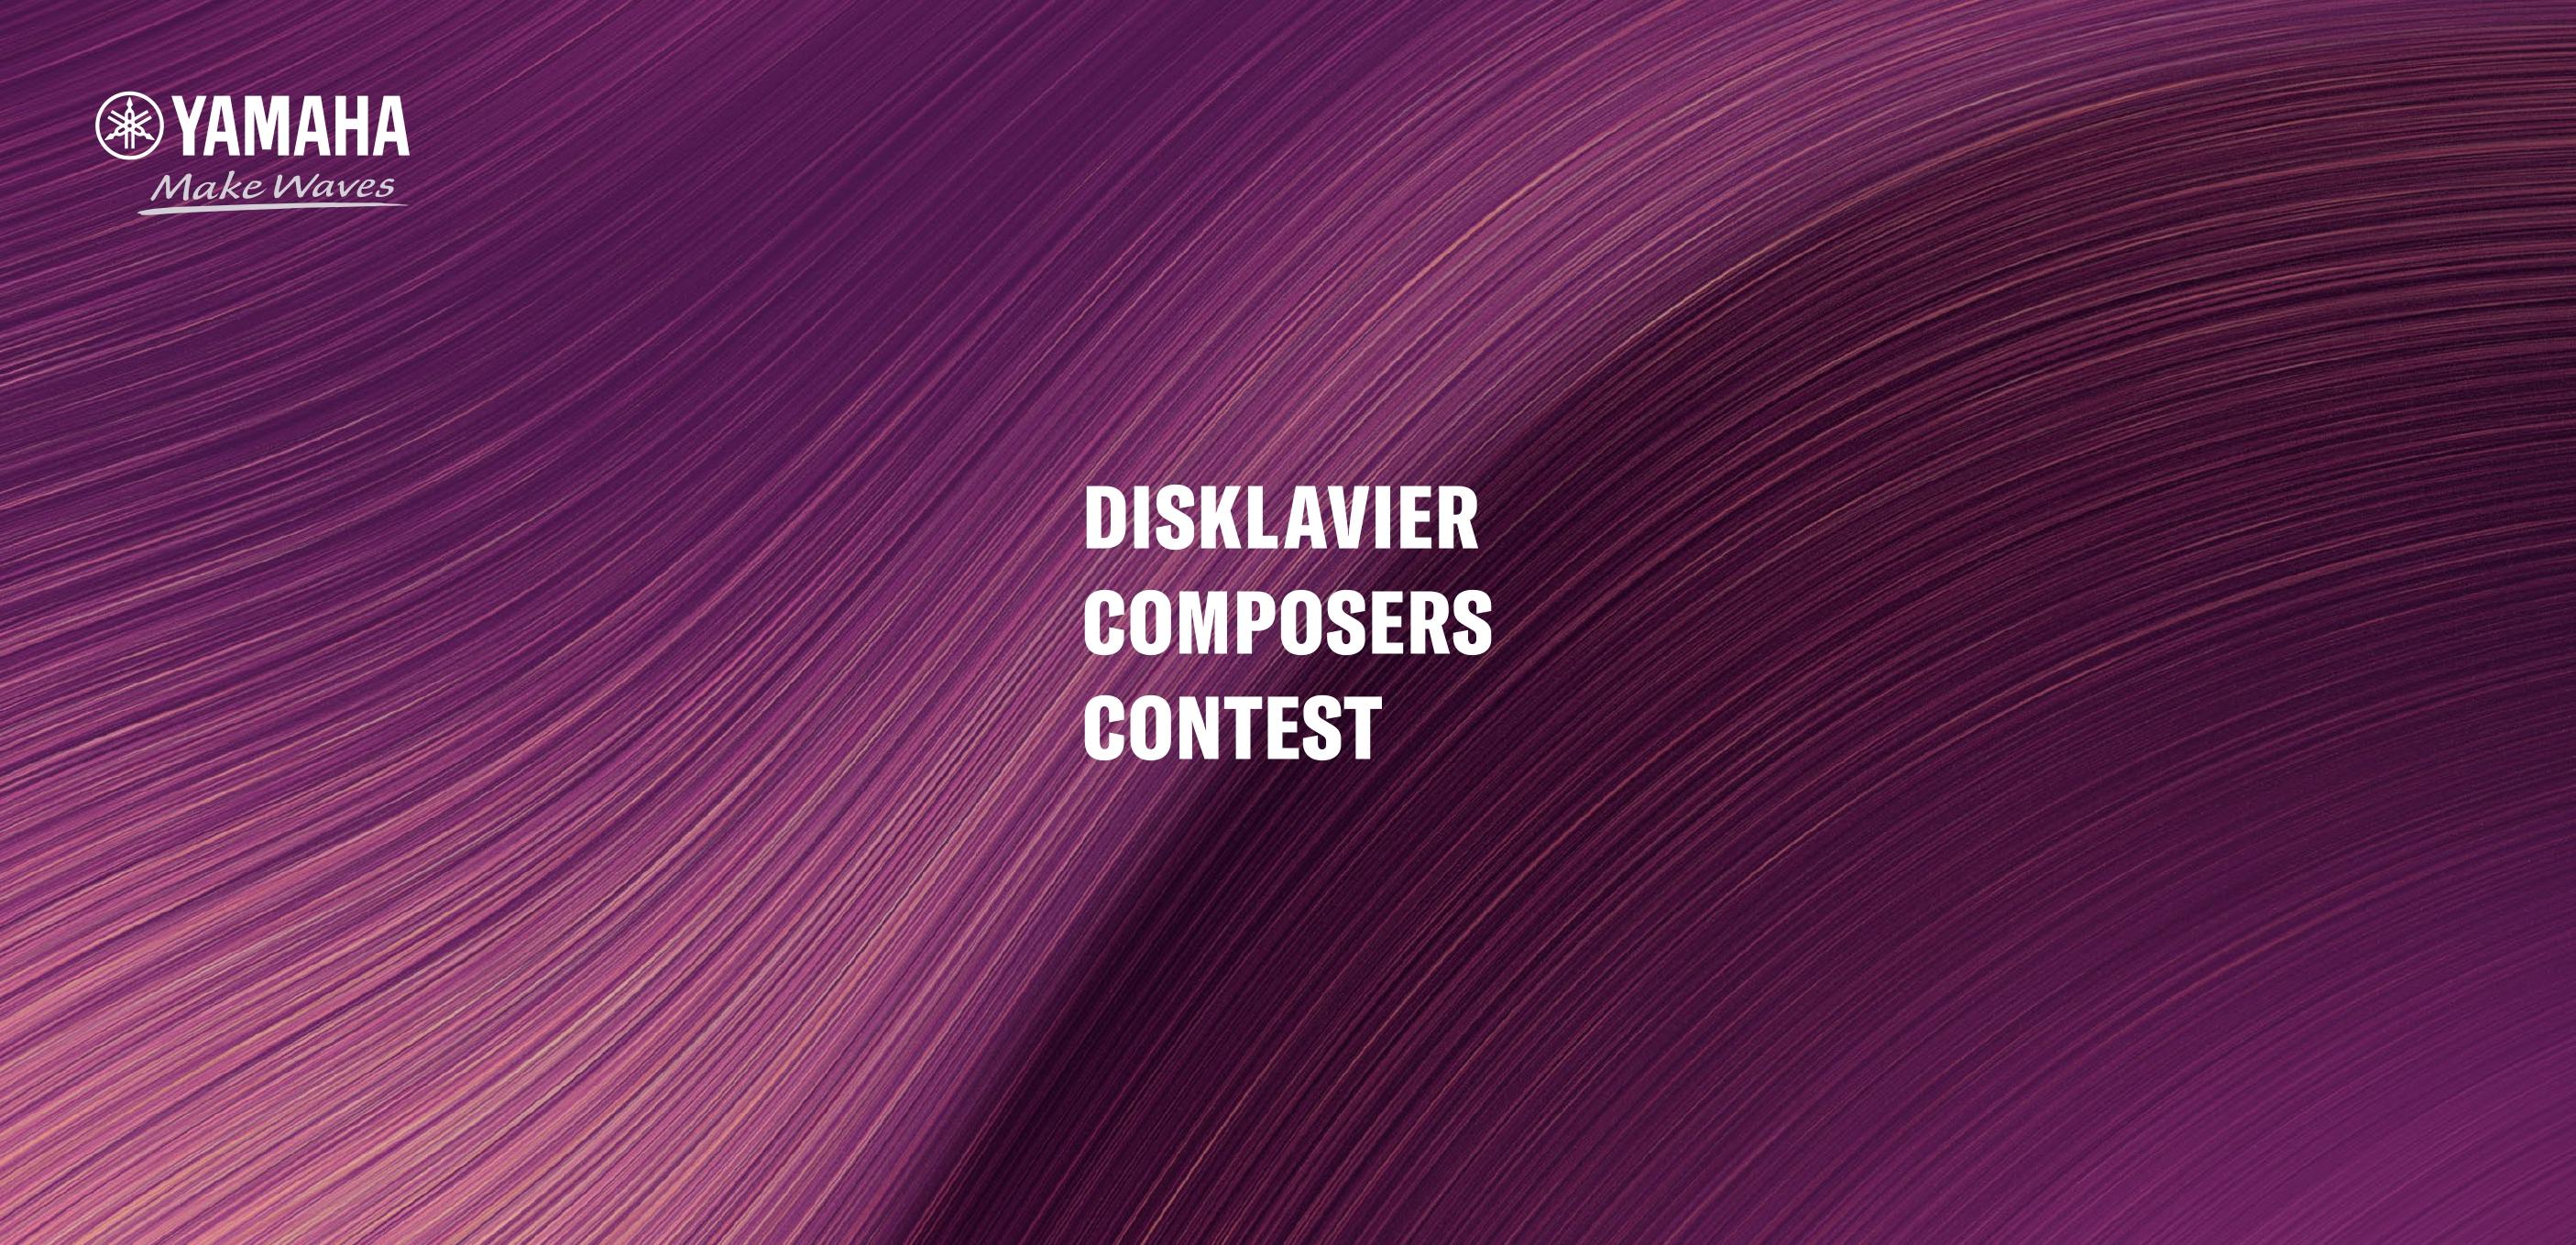 disklavier composers contest